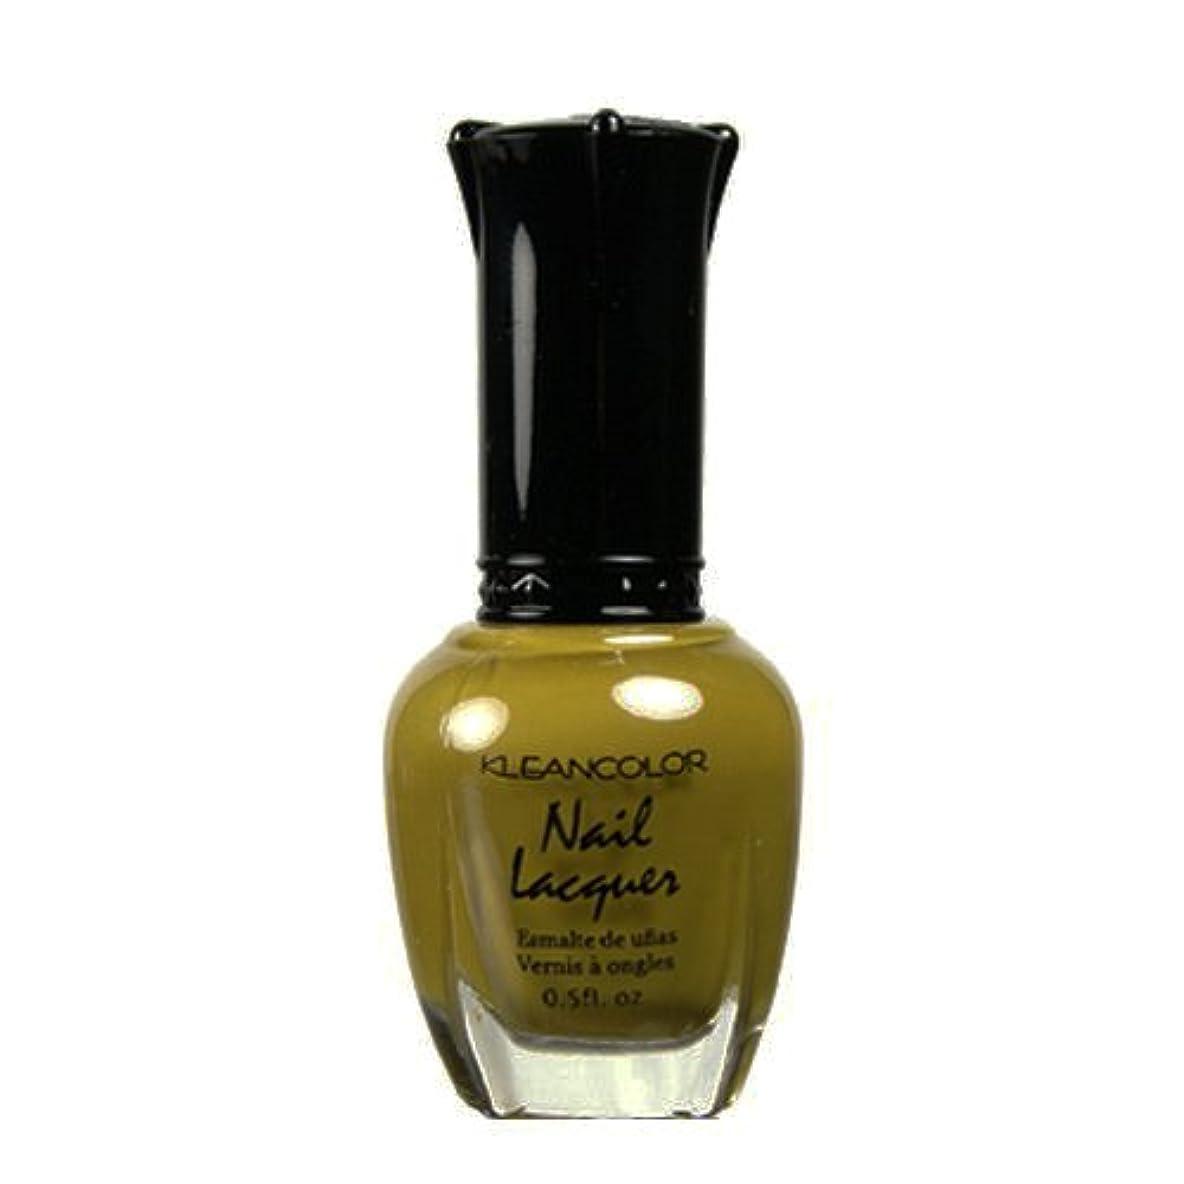 KLEANCOLOR Nail Lacquer 2 - Fashionista (並行輸入品)